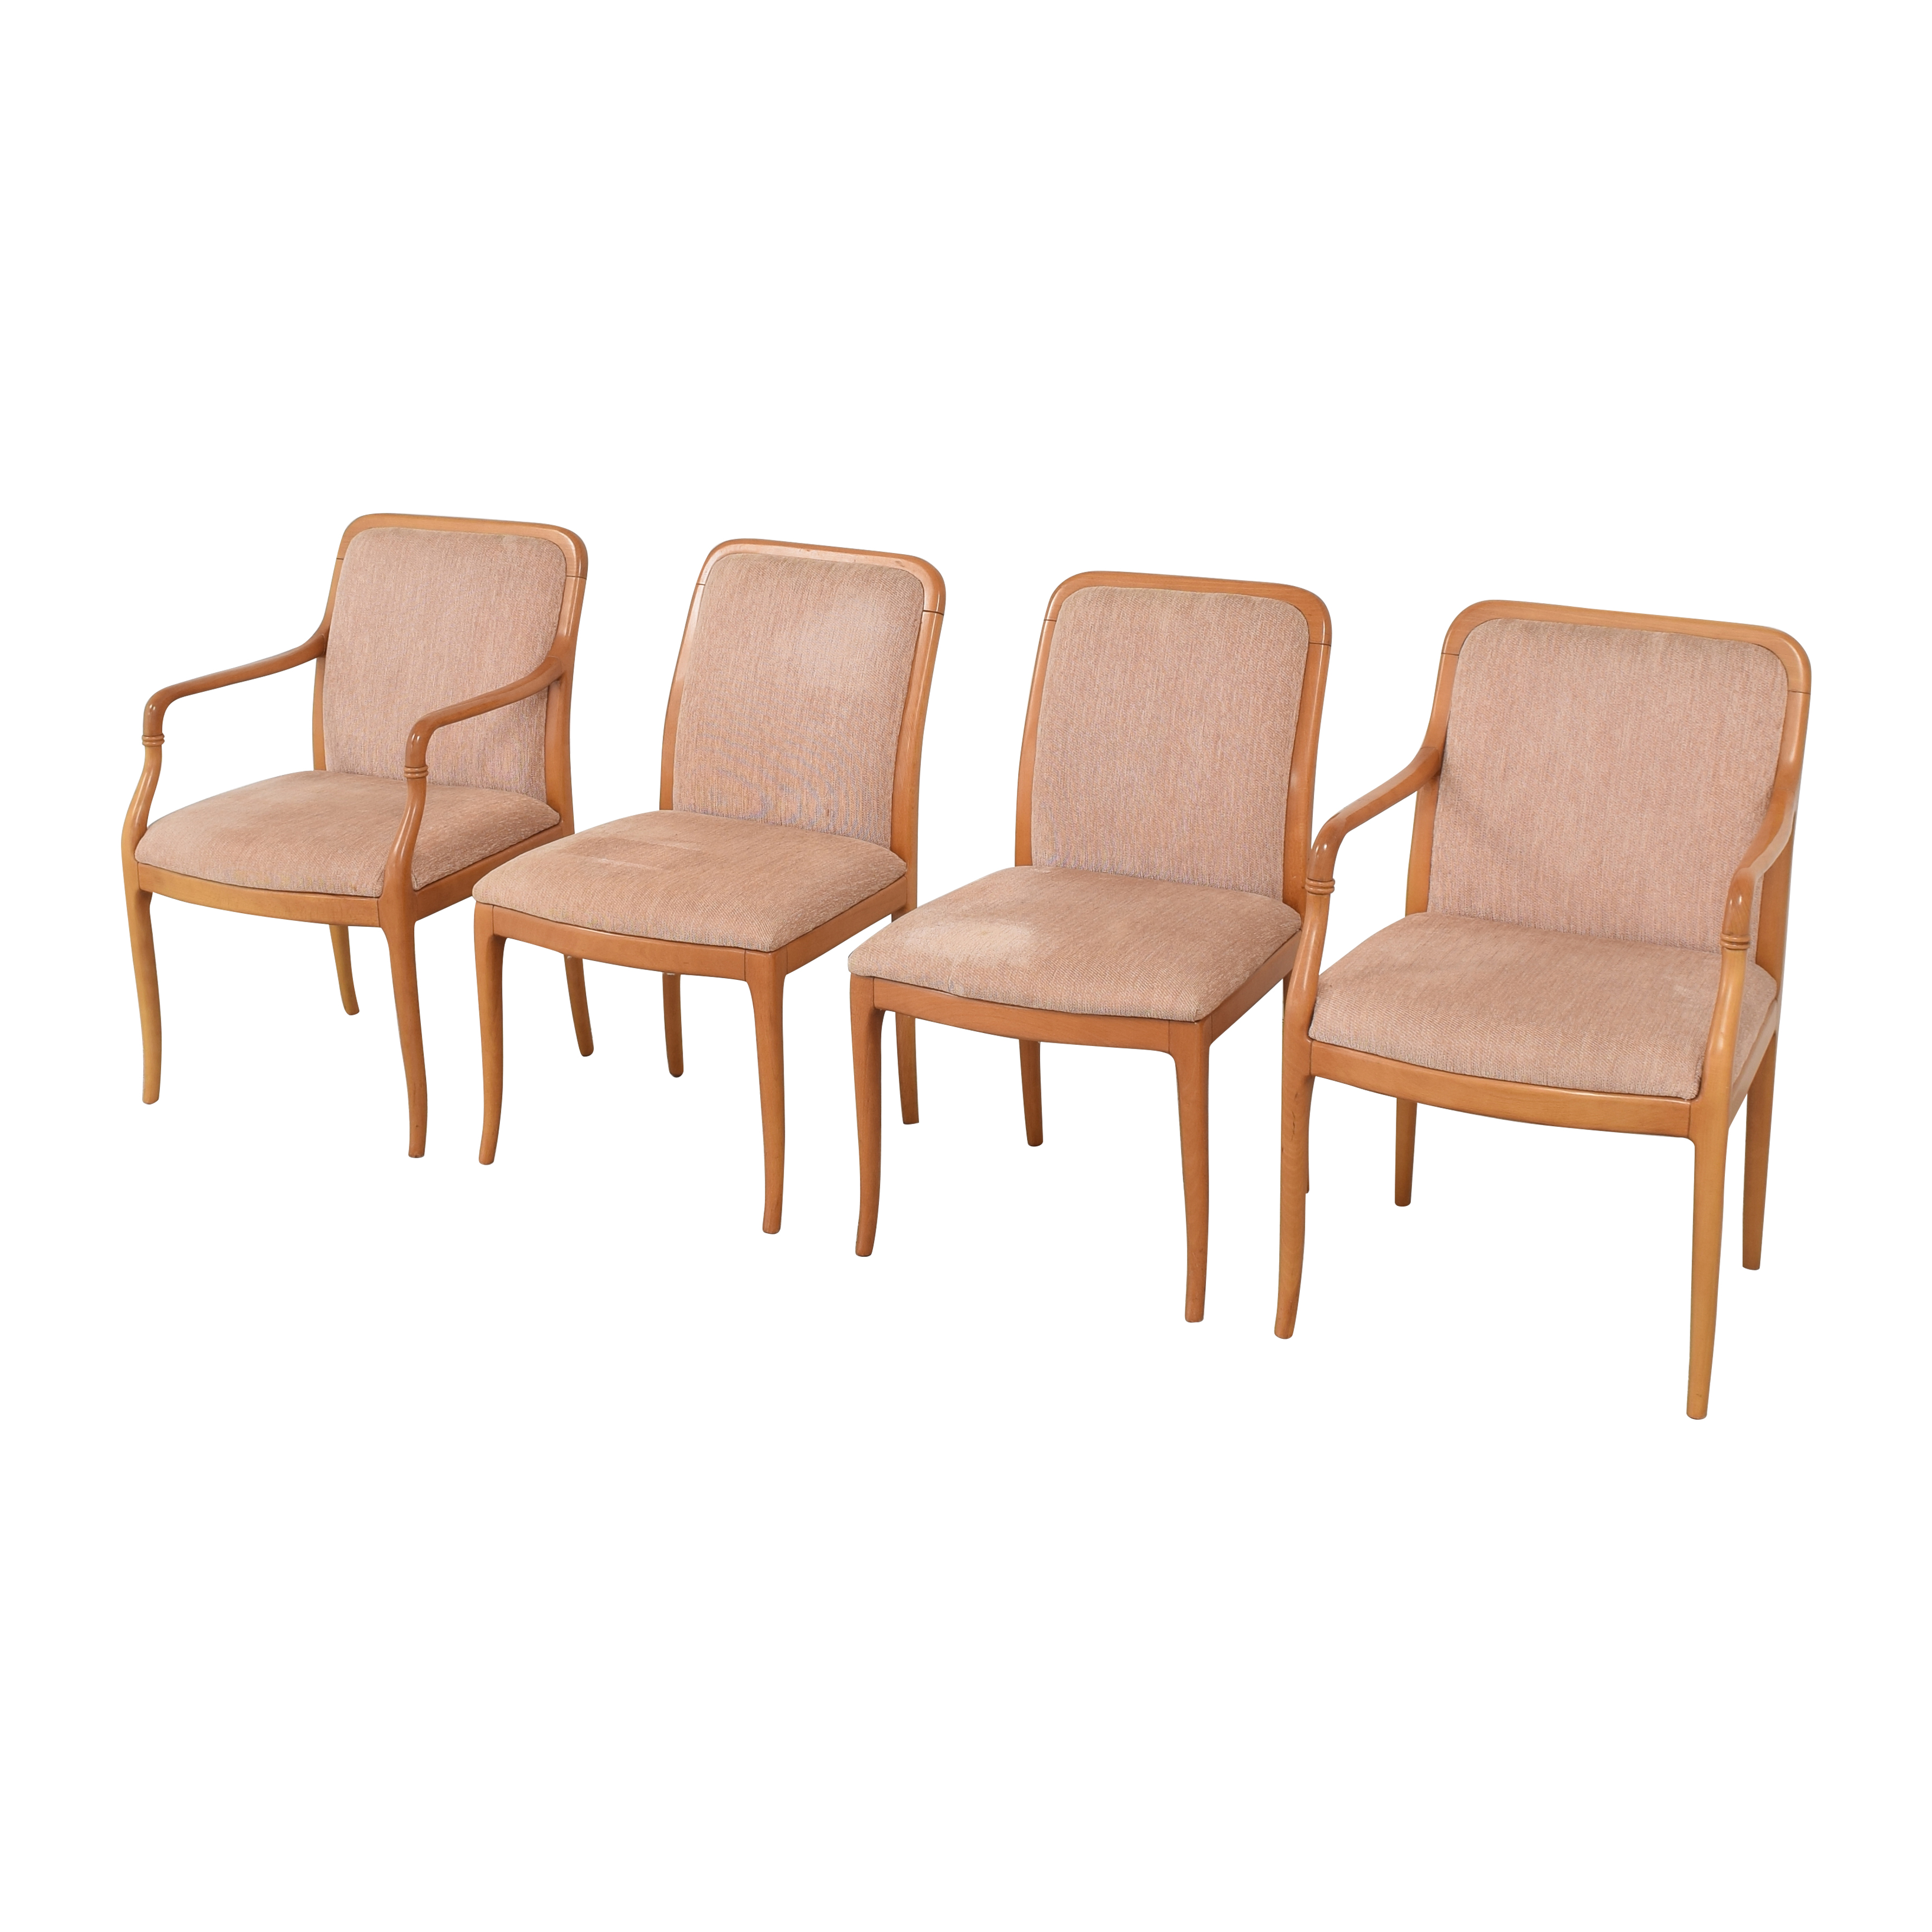 Directional Furniture Directional Furniture Dining Chairs Chairs